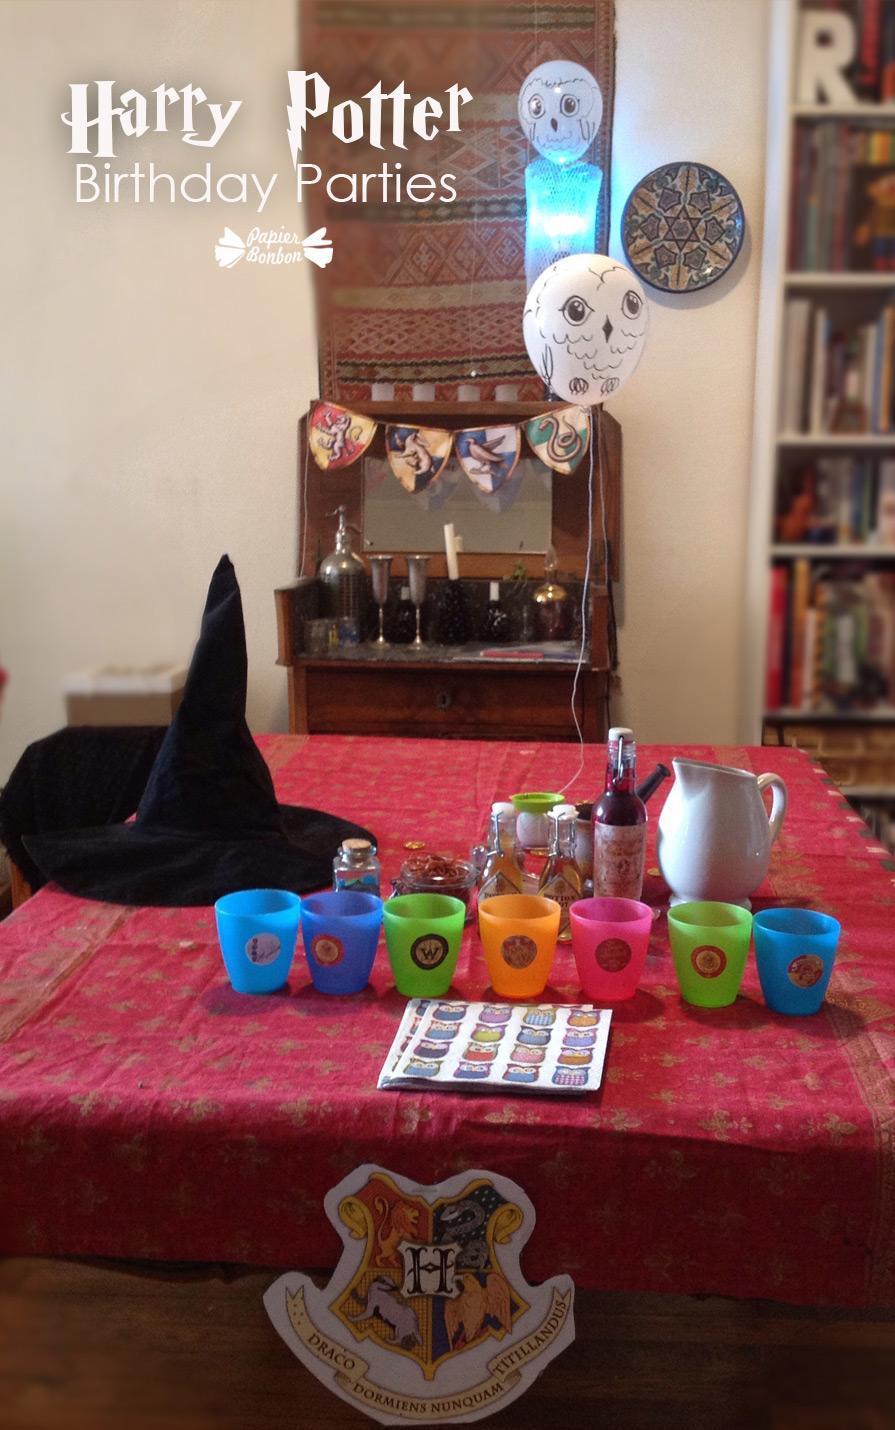 Harry potter birthday parties printables papier bonbon for Decoration harry potter